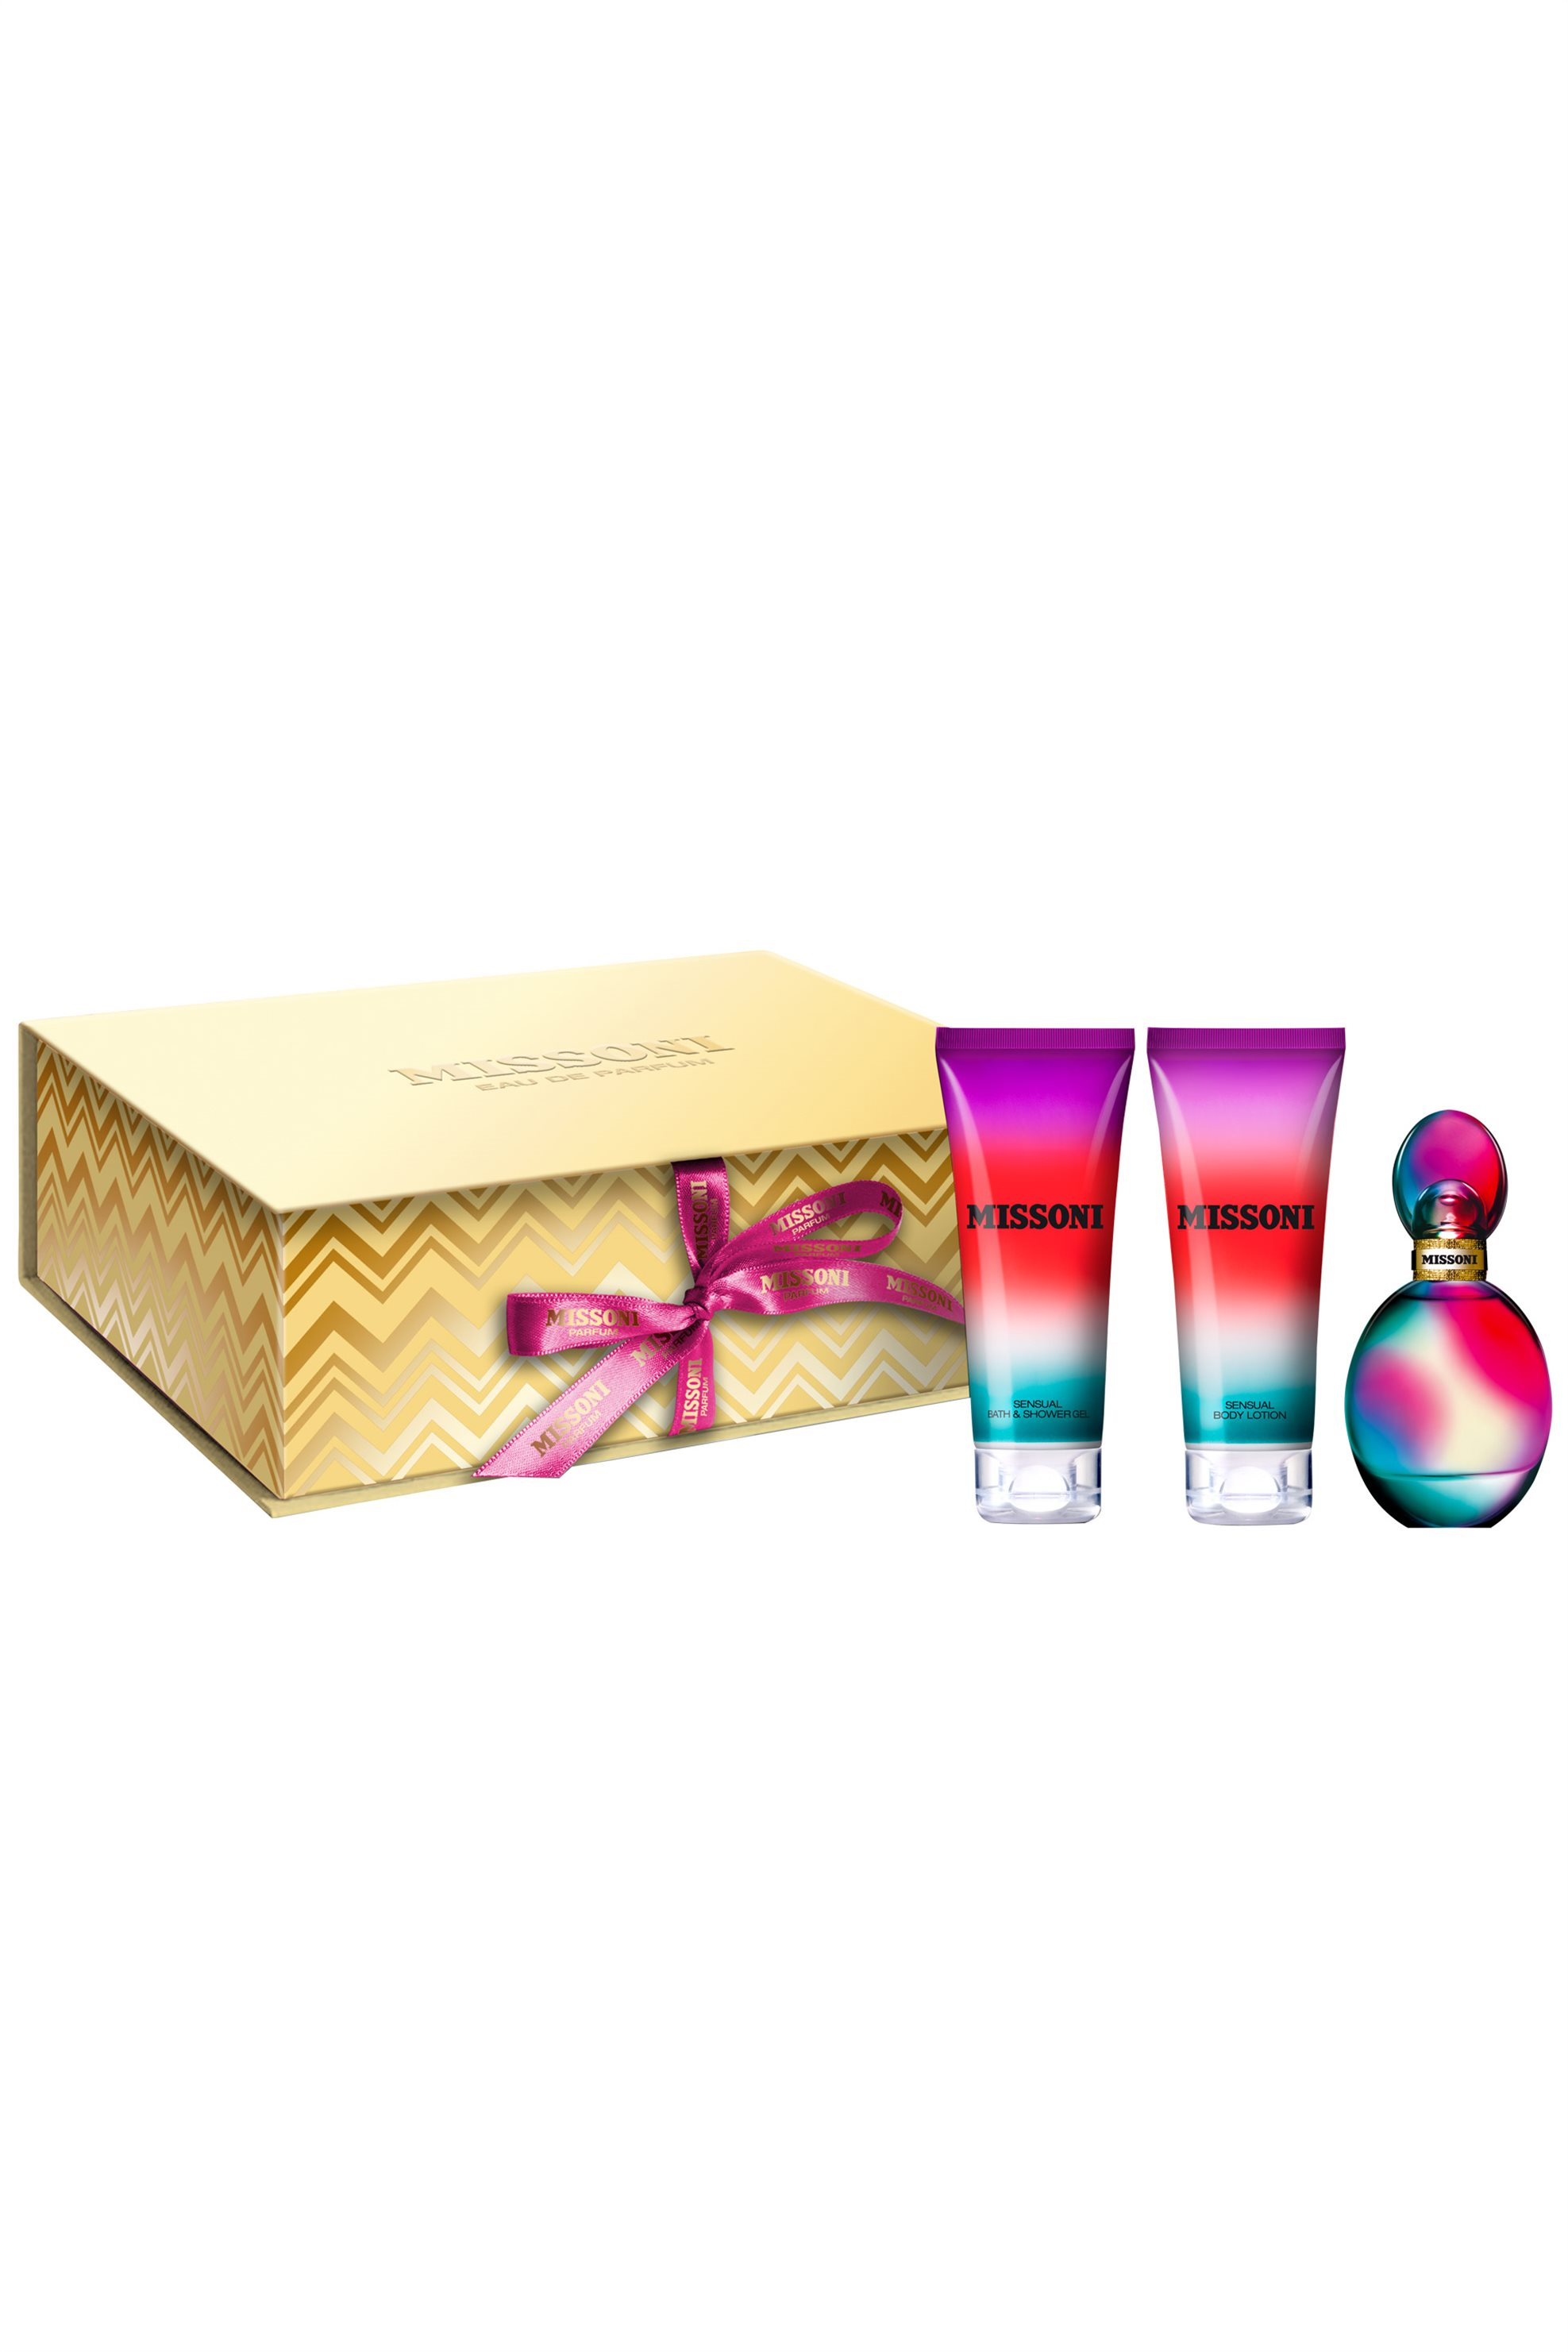 Missoni Missoni Set EdP 50 ml with body lotion & shower gel - 8000447 ομορφια   σετ προϊοντων